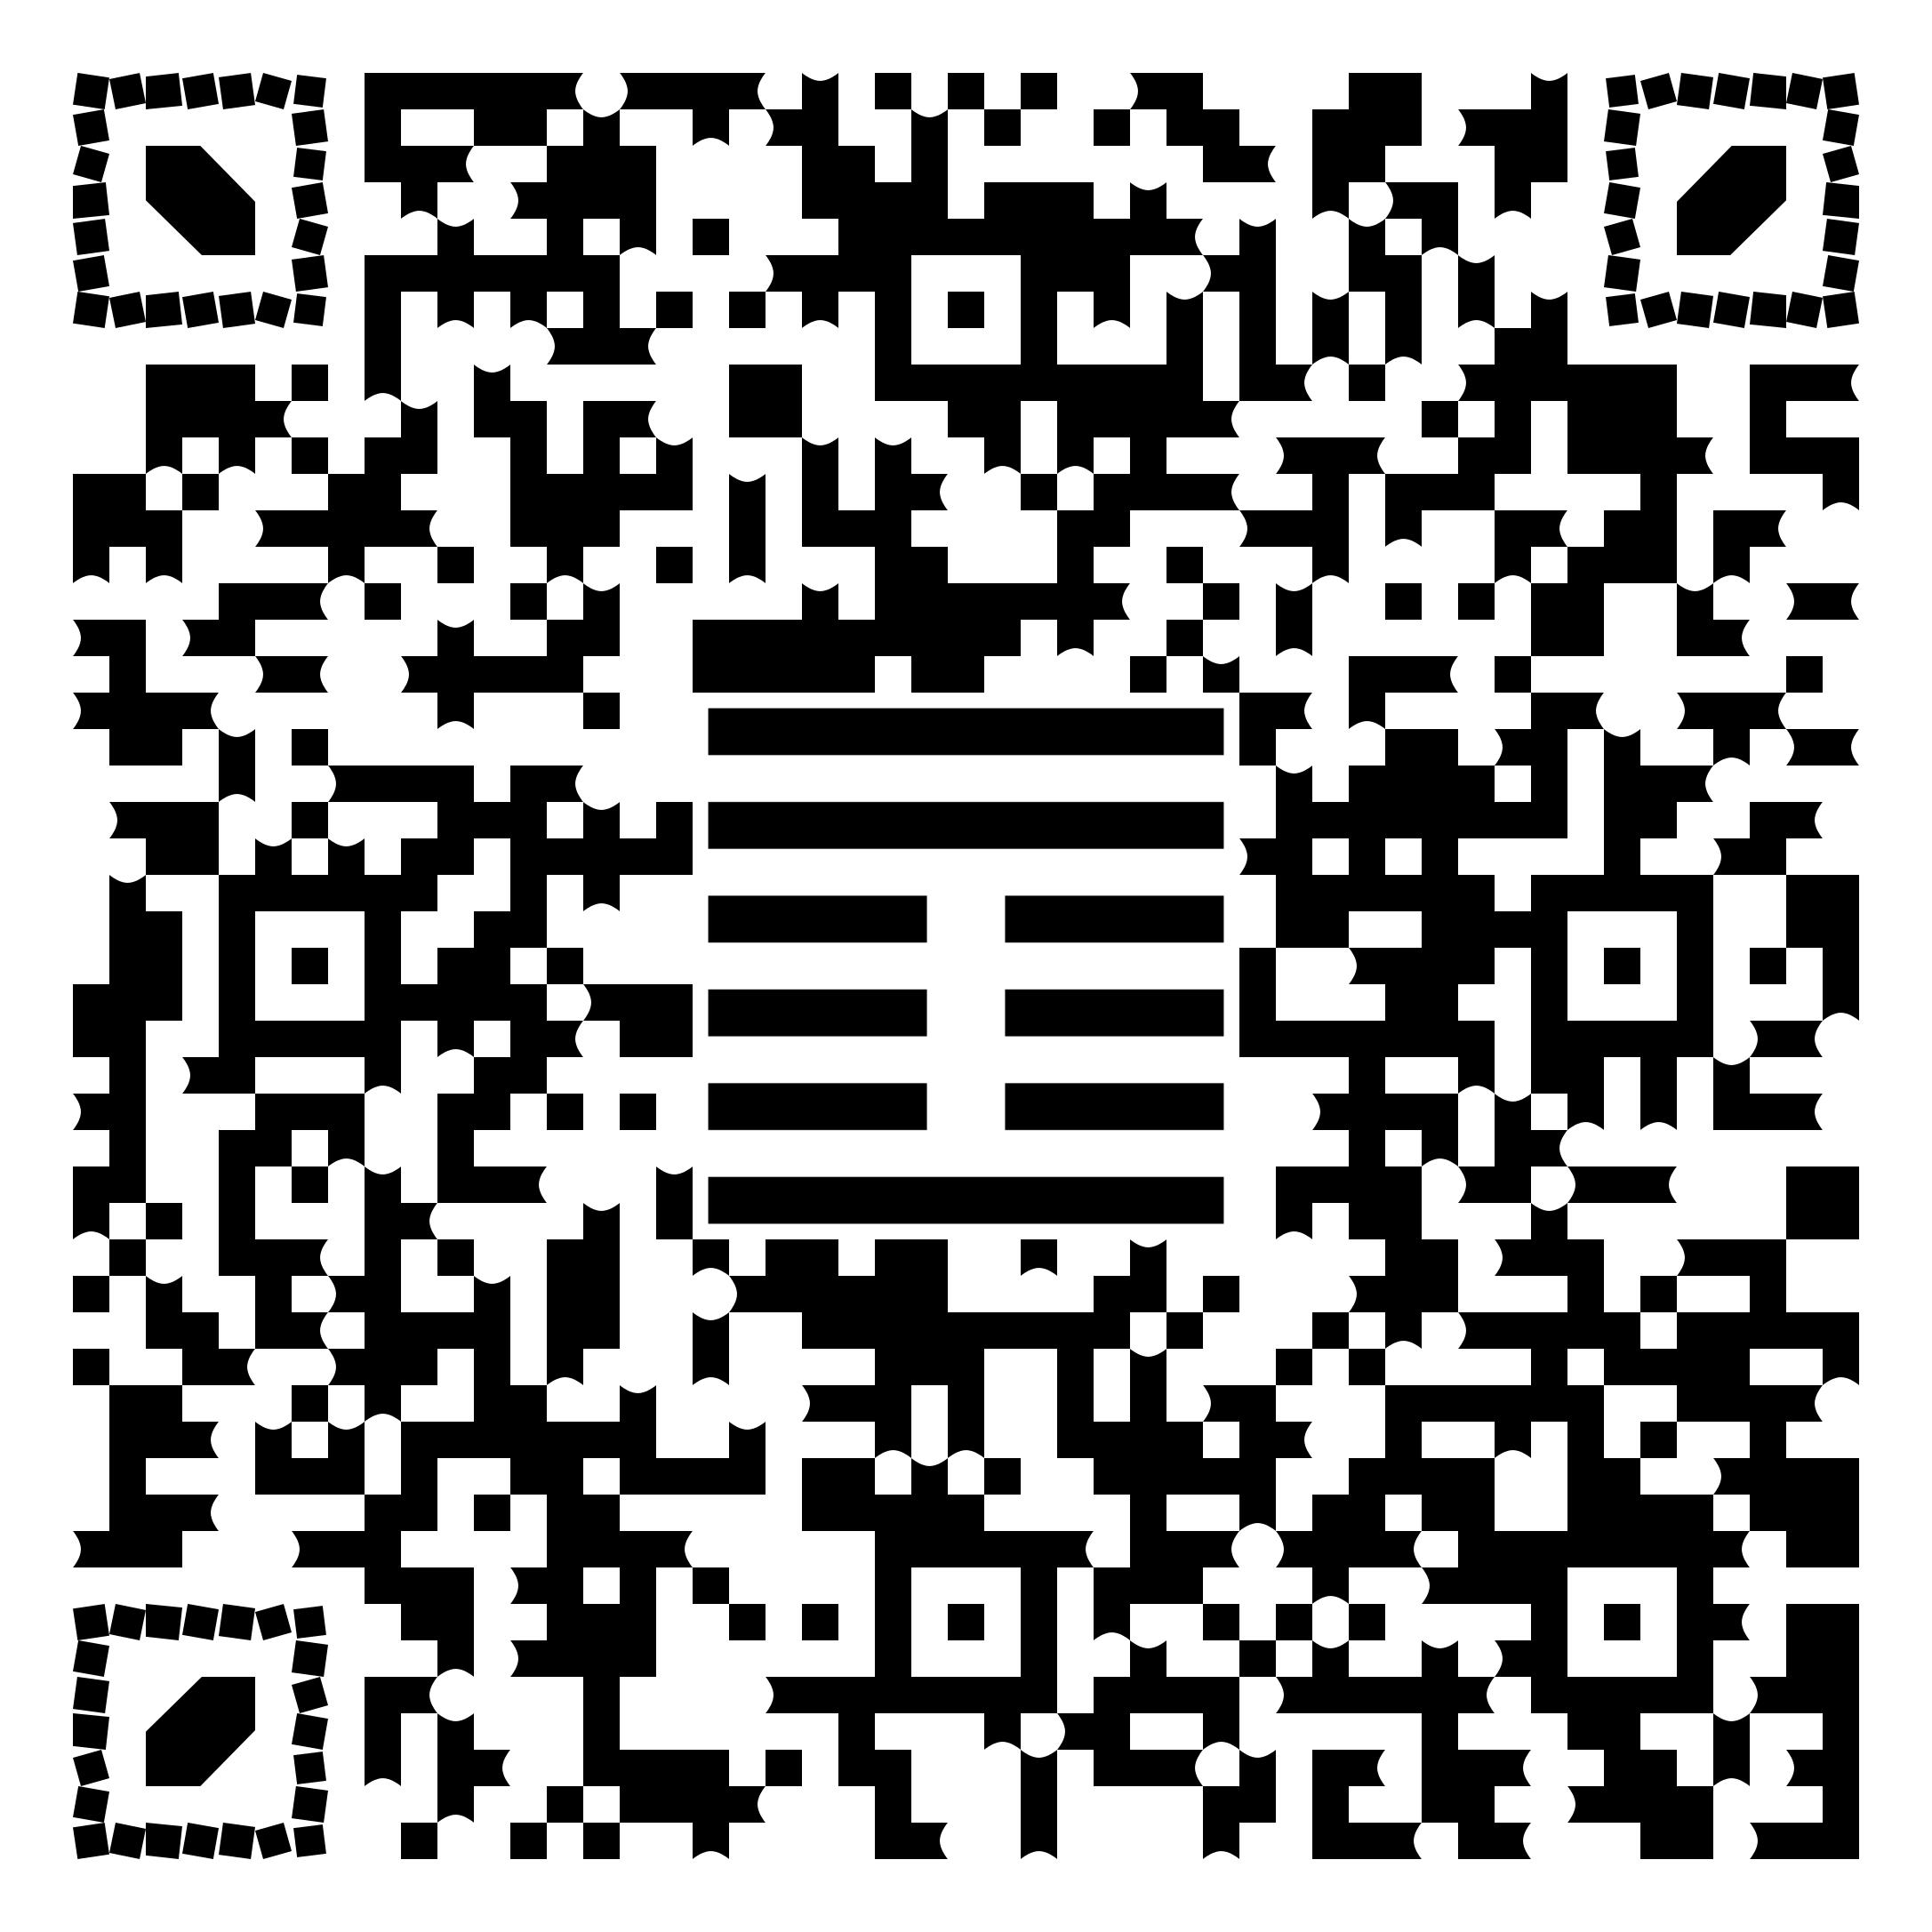 qr-code-42.png